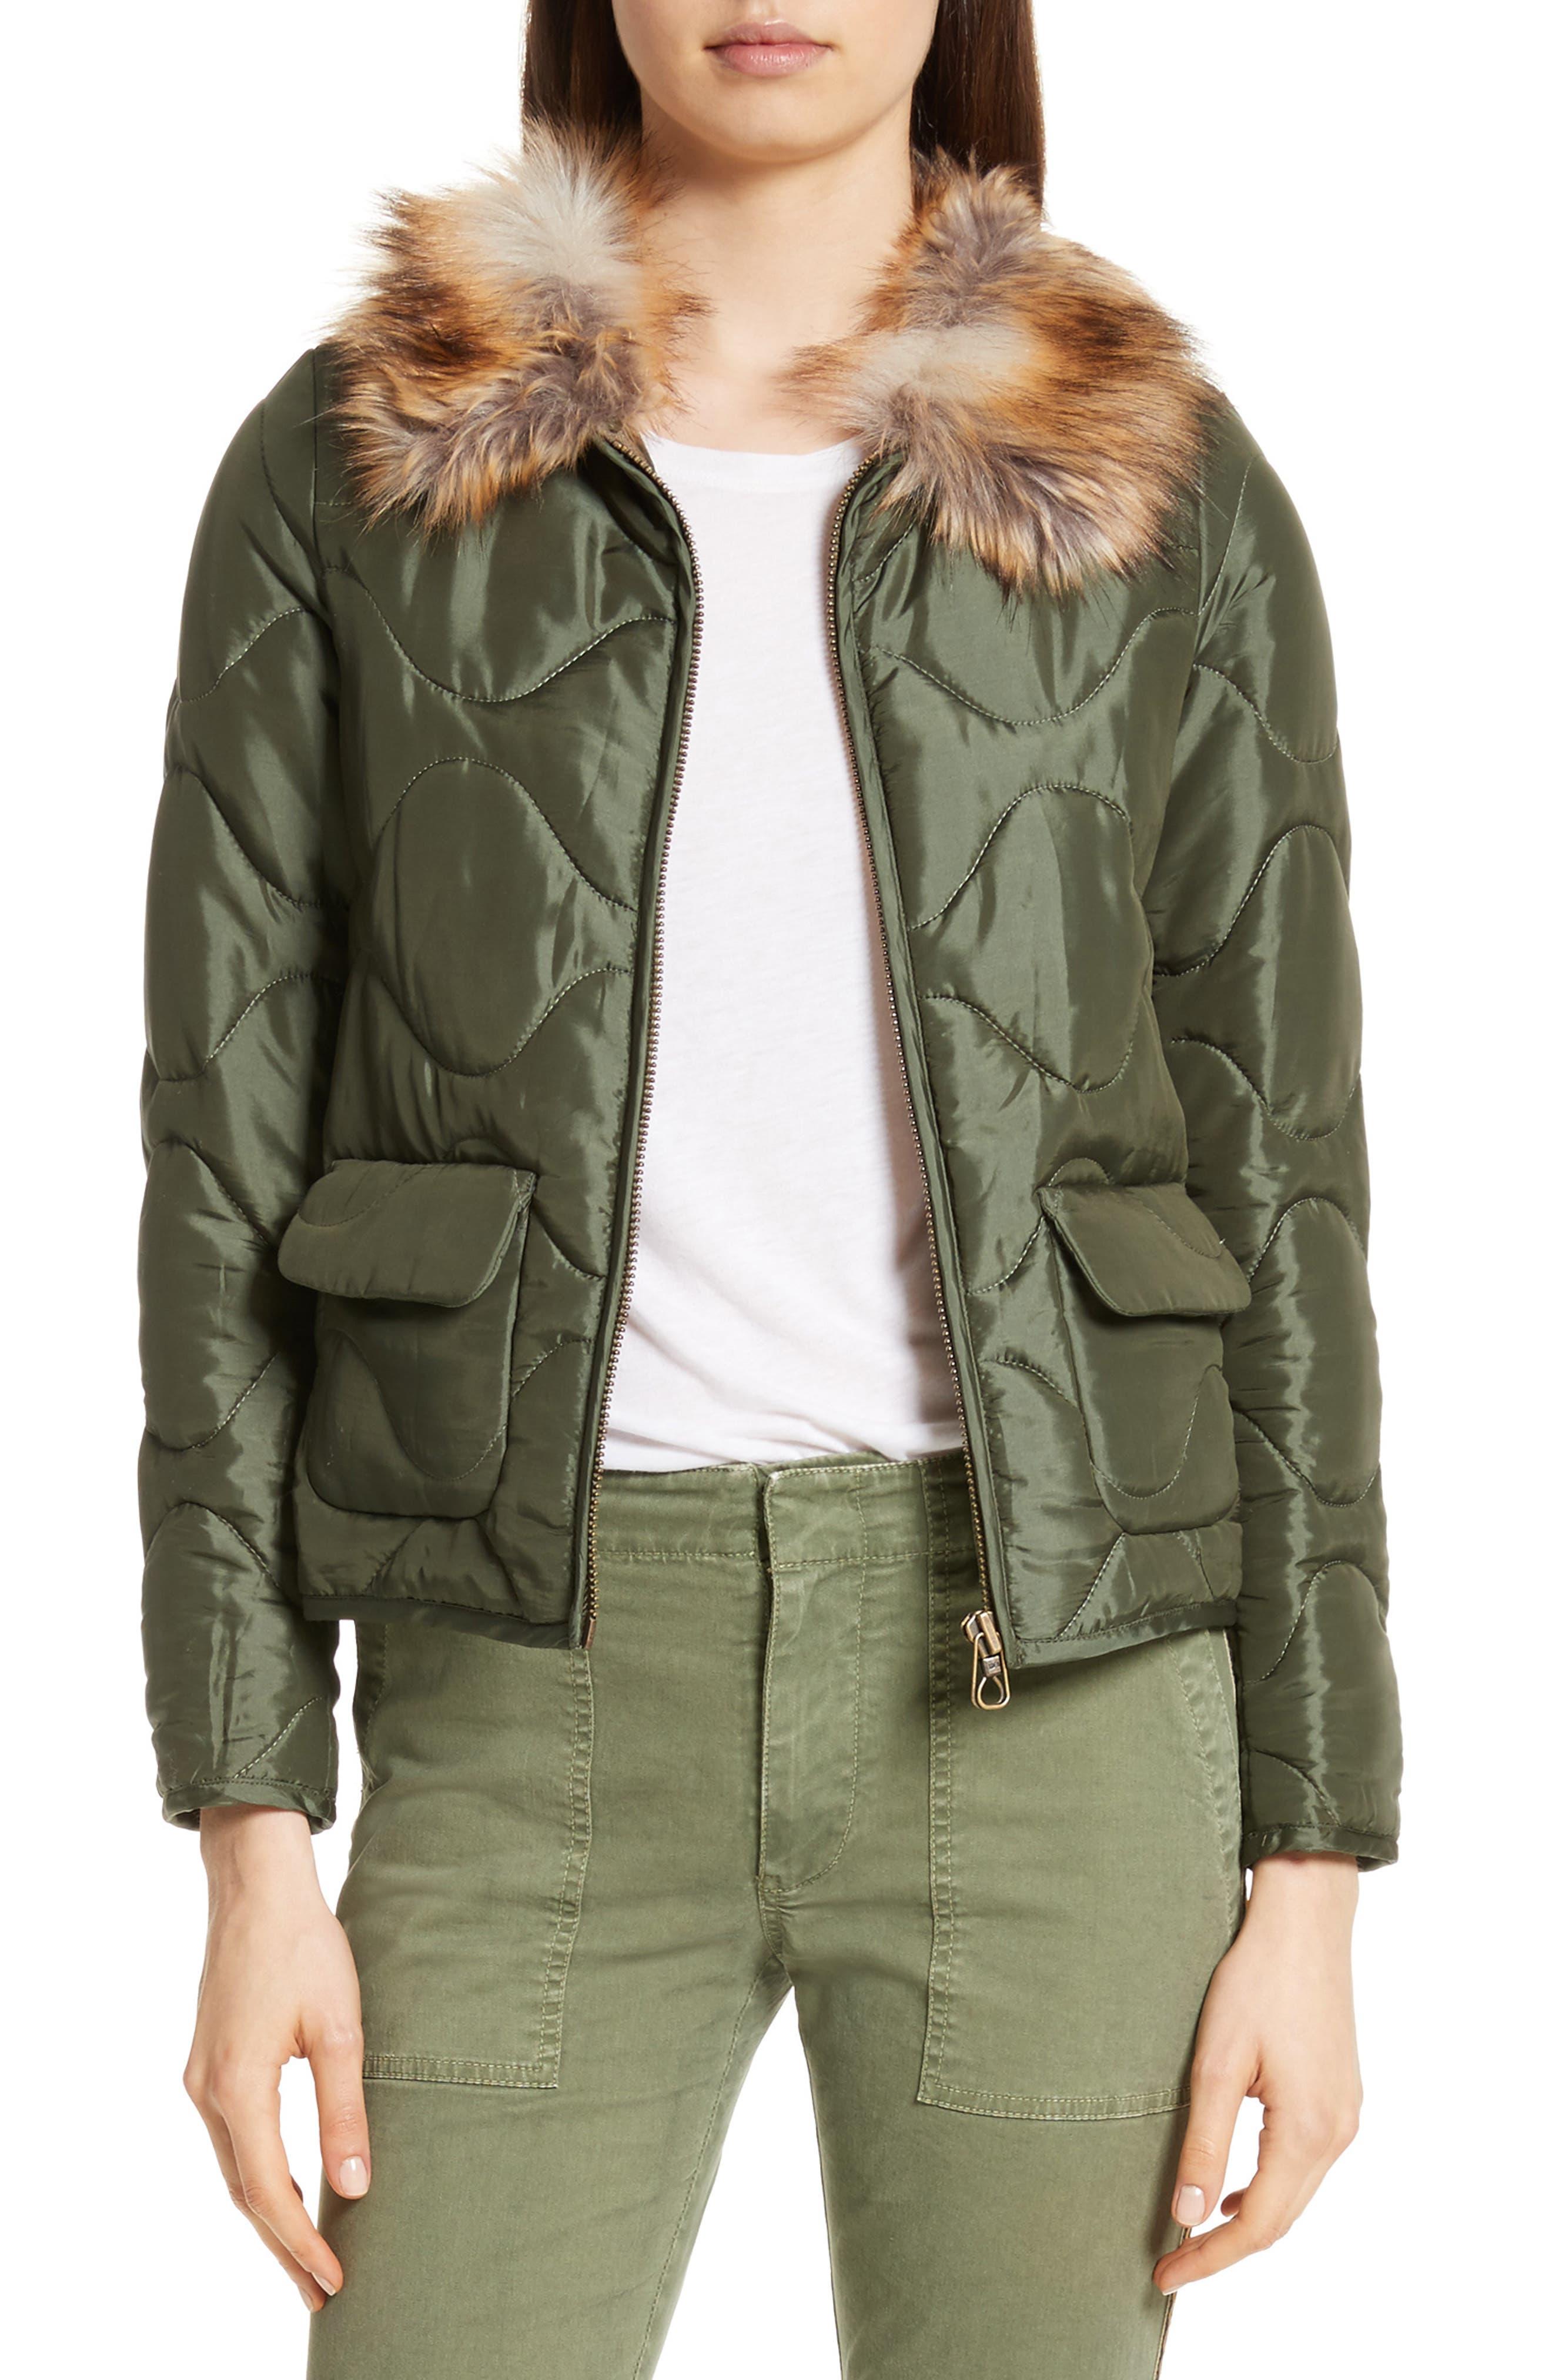 Alvy Faux Fur Collar Quilted Coat,                             Main thumbnail 1, color,                             310